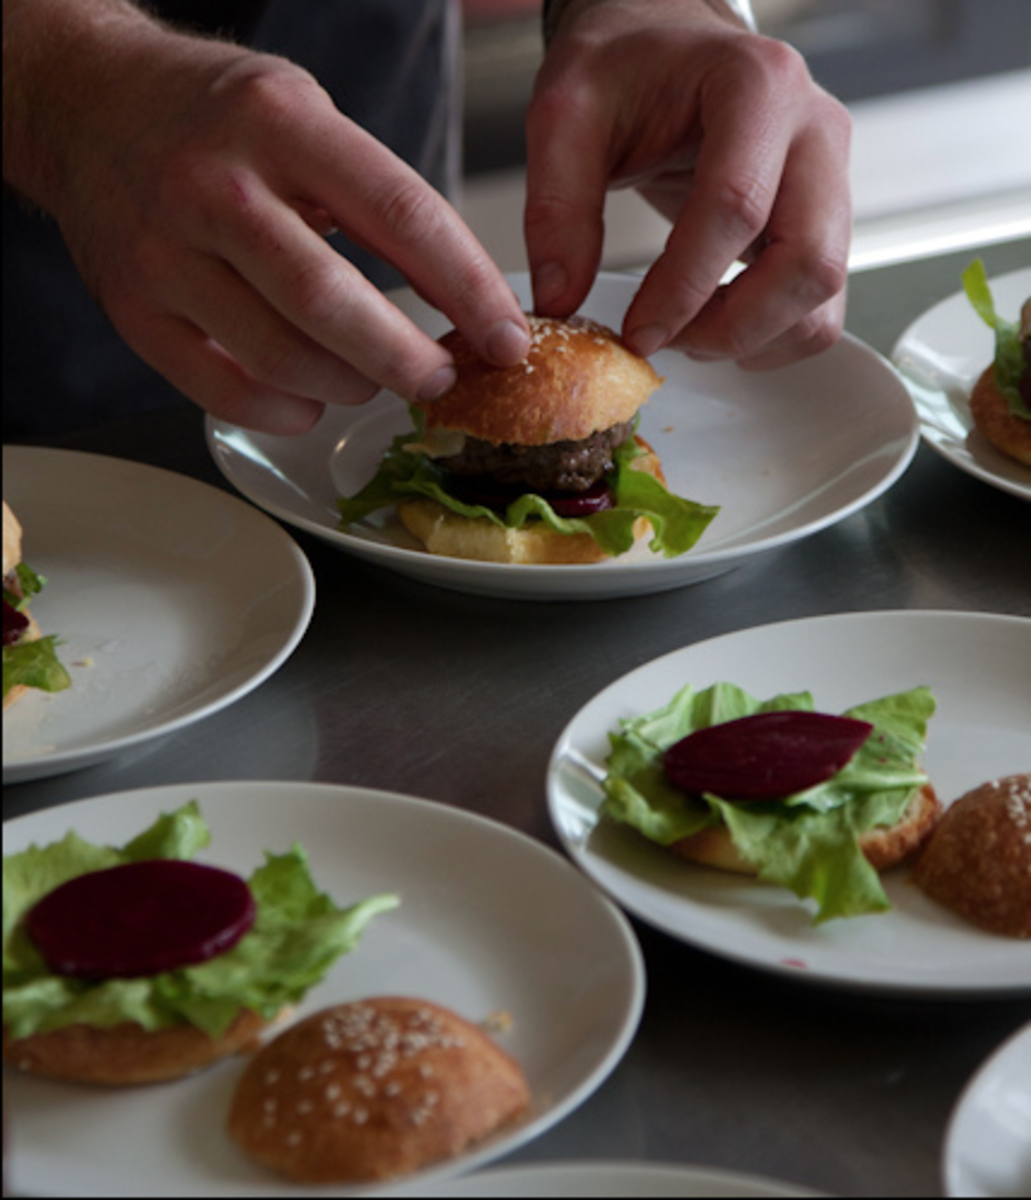 beetroot on hamburger